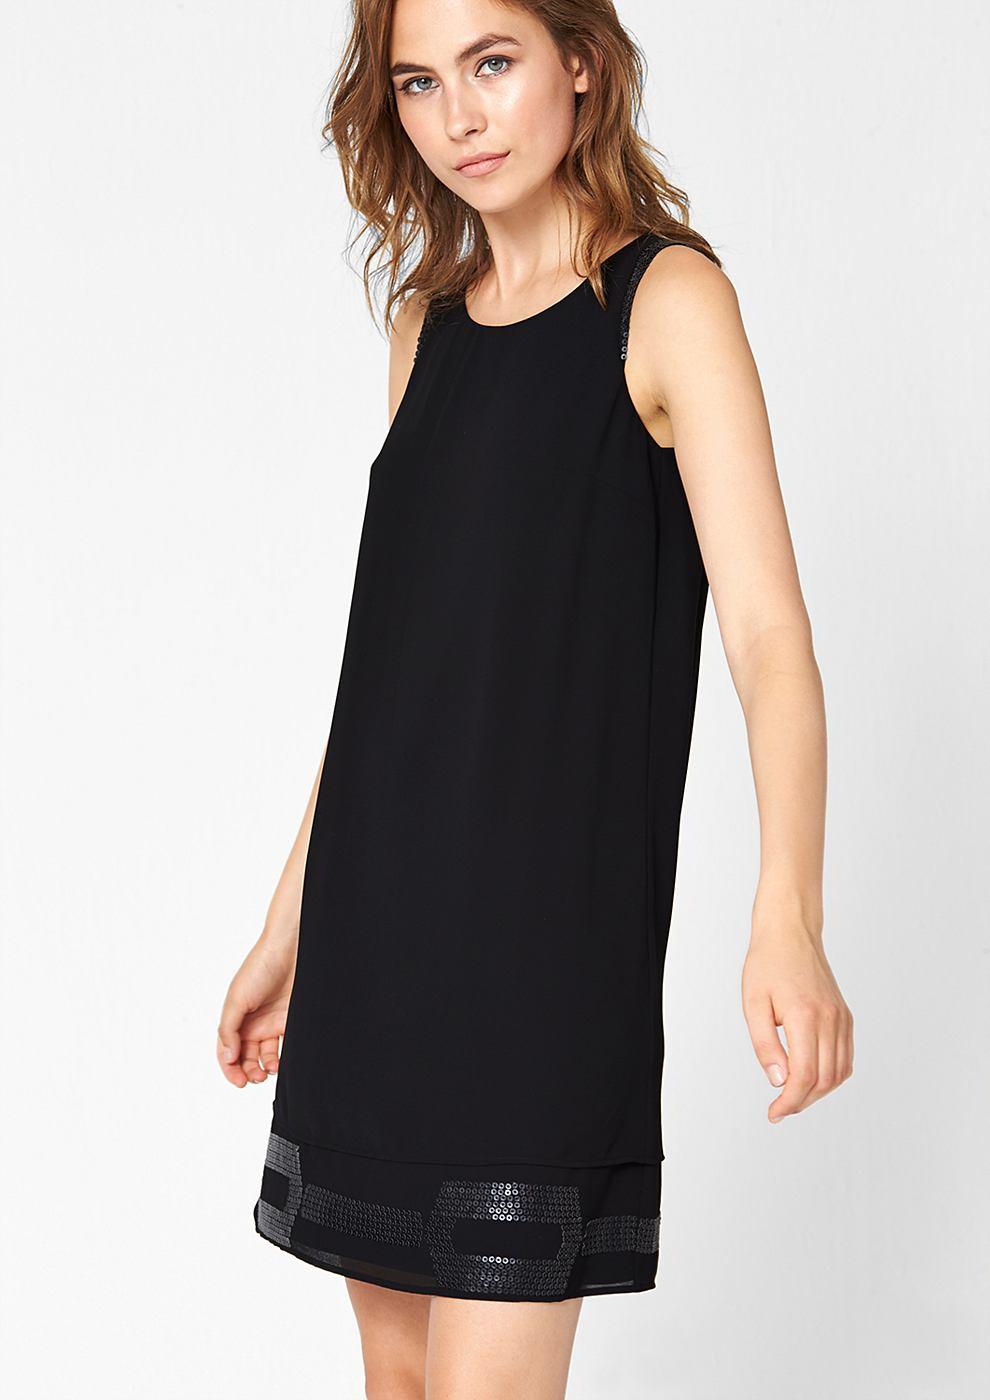 s.Oliver Premium chiffon jurk met imitatieleren pailletjes zwart